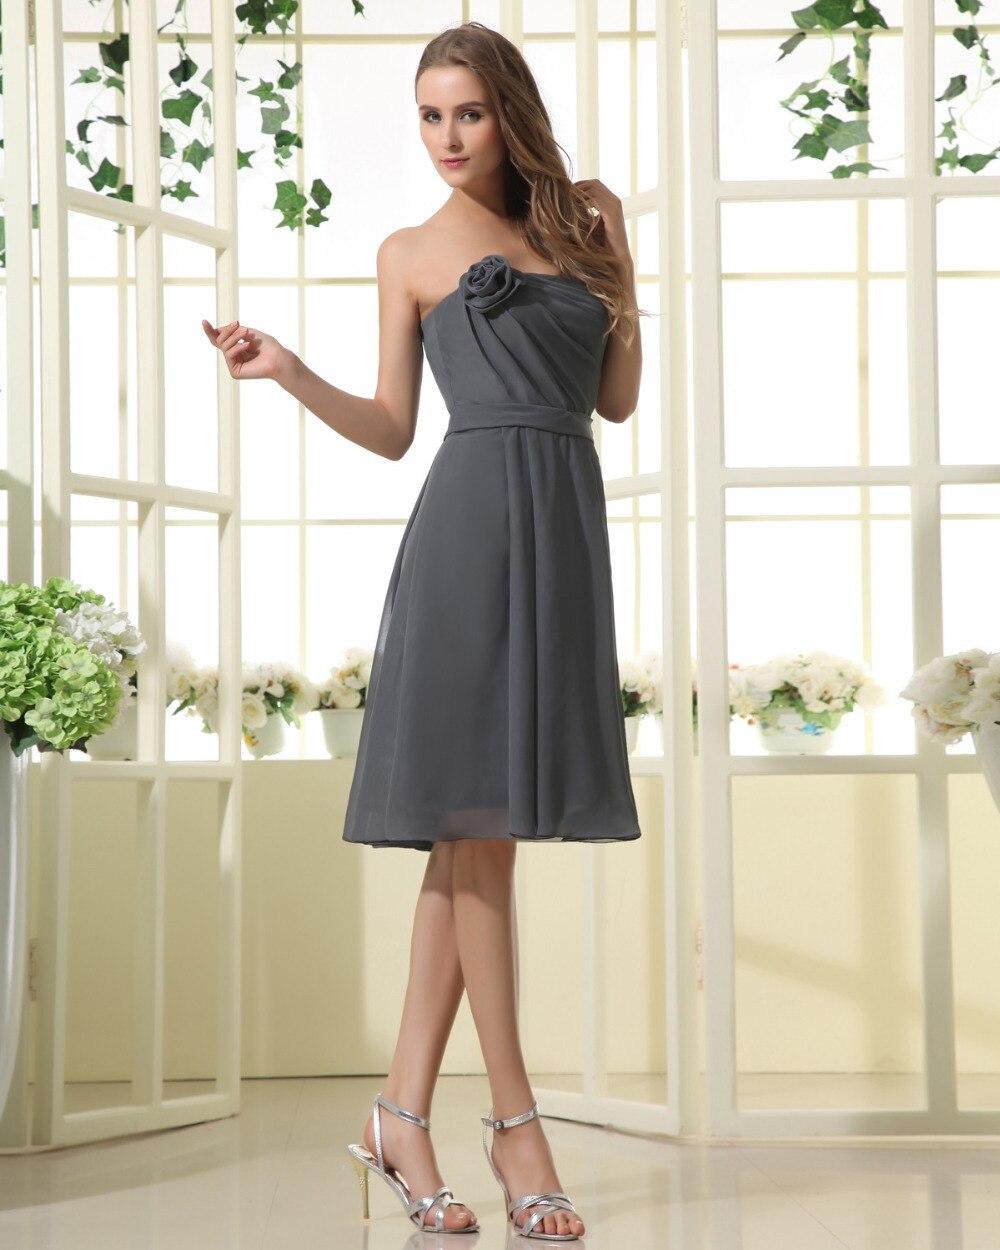 Romantic Grey Silver Bridesmaids Dresses Short Chiffon Empire Waist ...